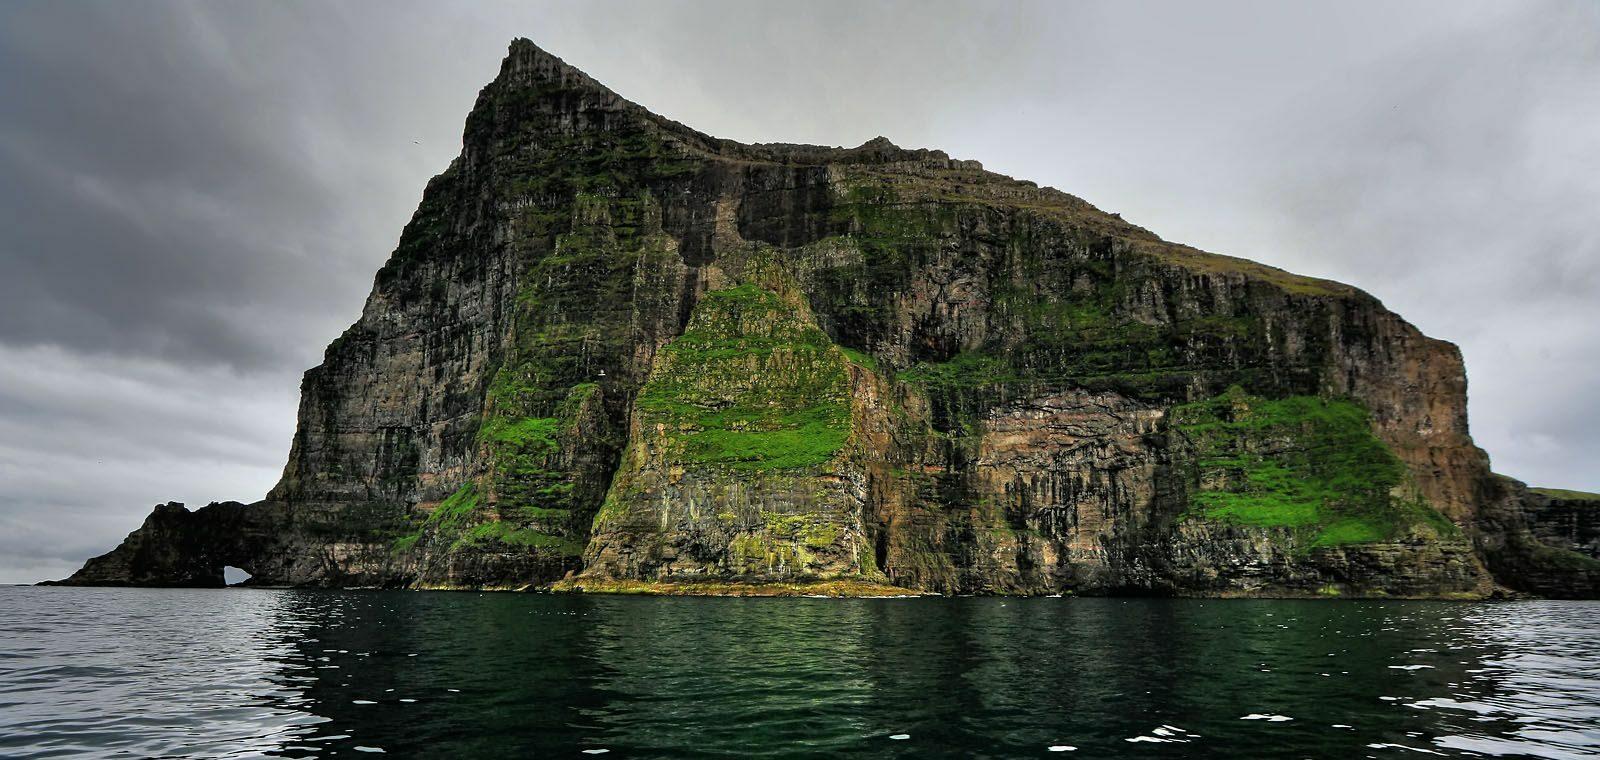 cape-enniberg-guide-to-faroe-islands 2